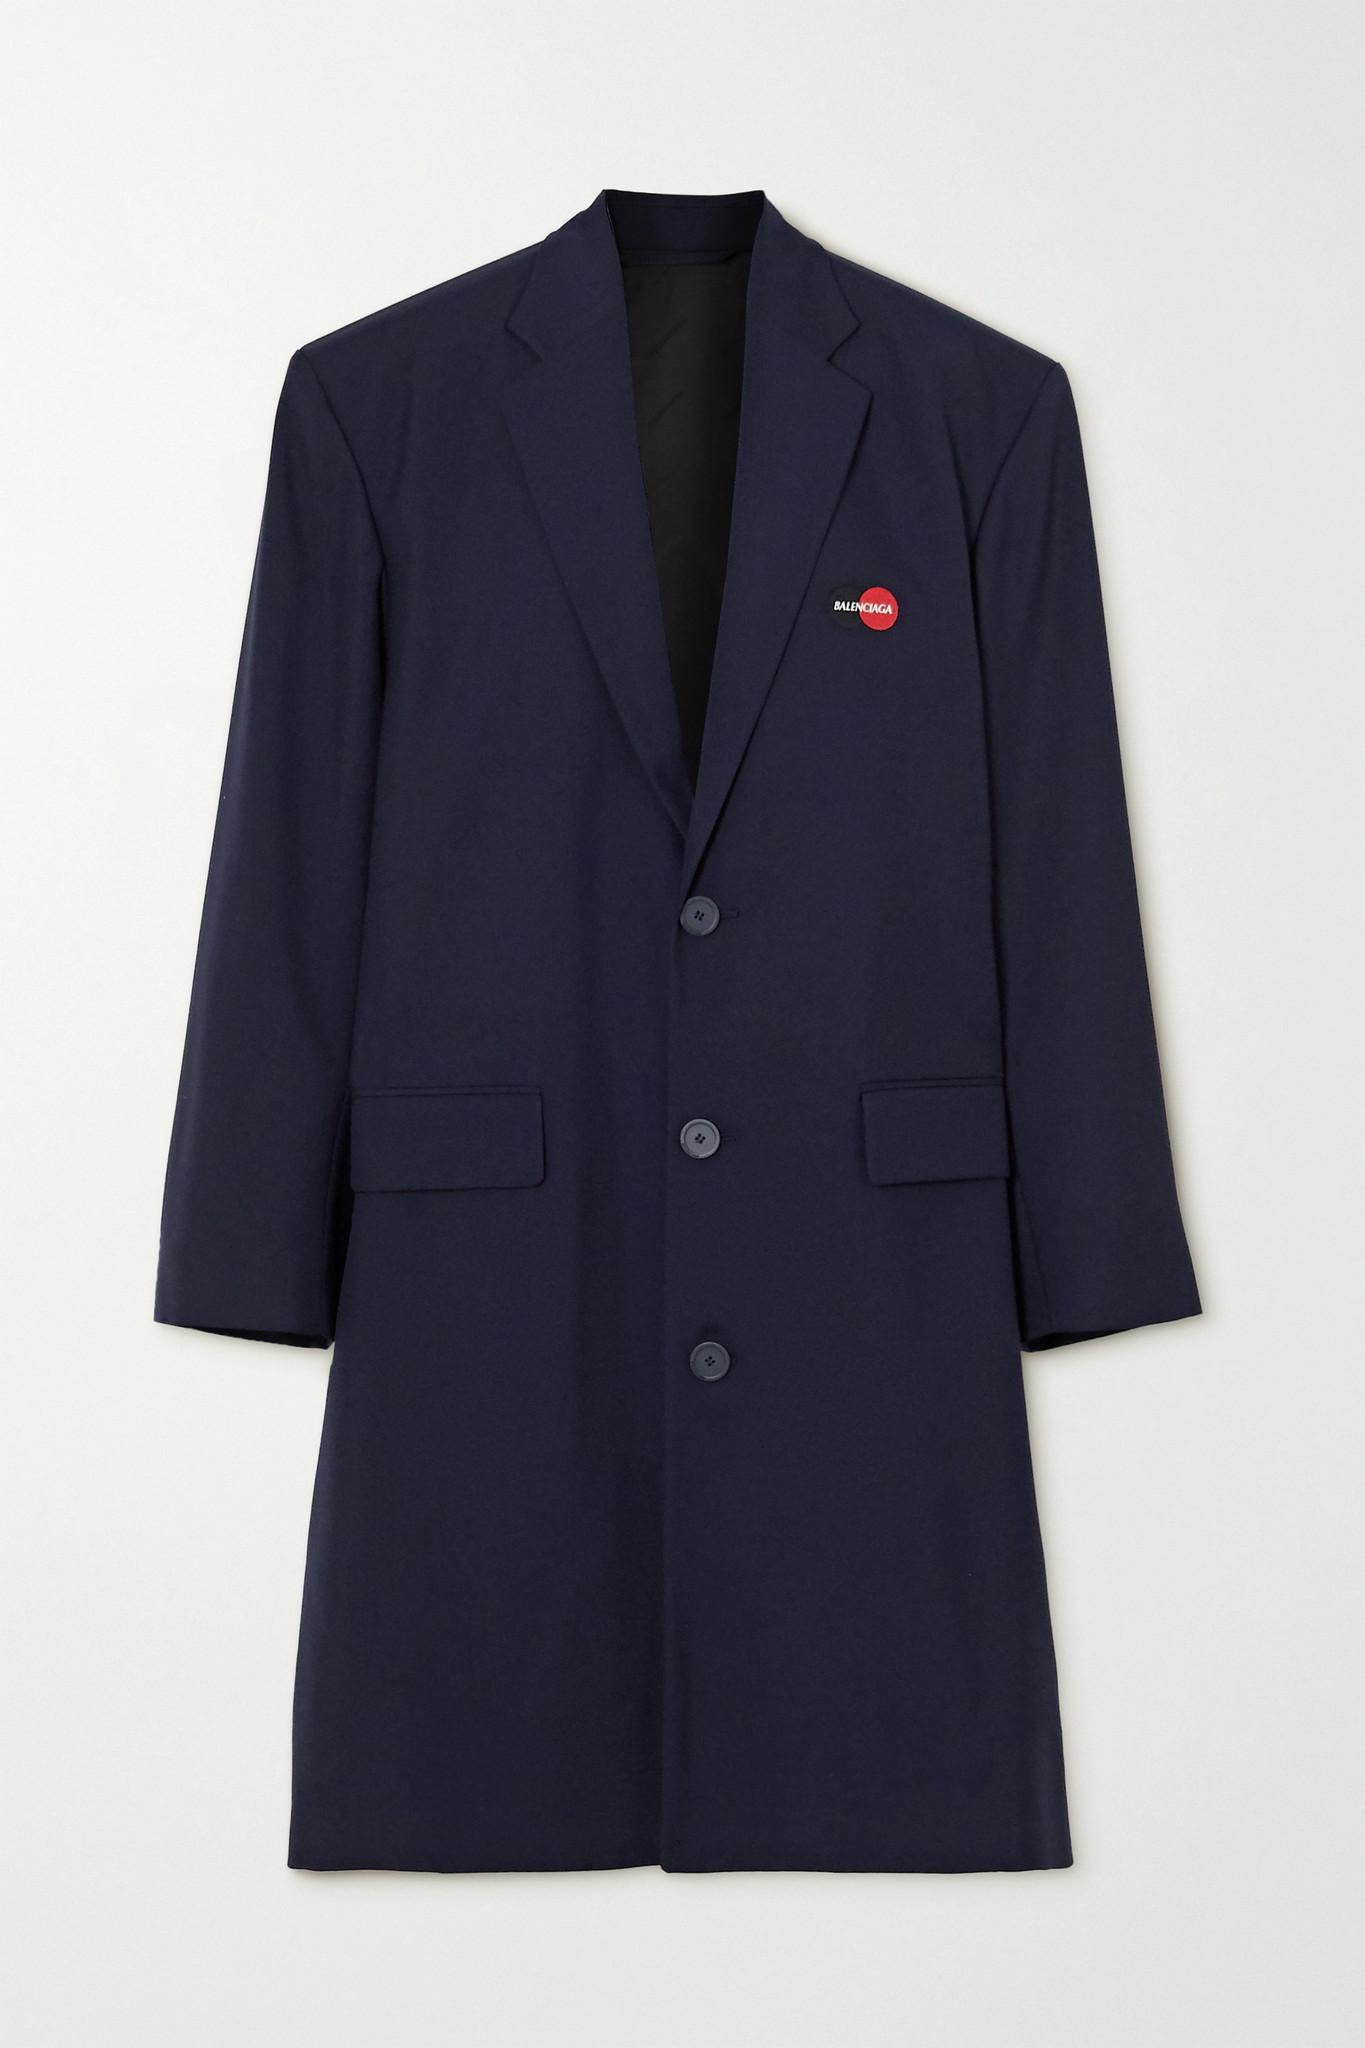 BALENCIAGA - Embroidered Wool-blend Coat - Blue - FR38